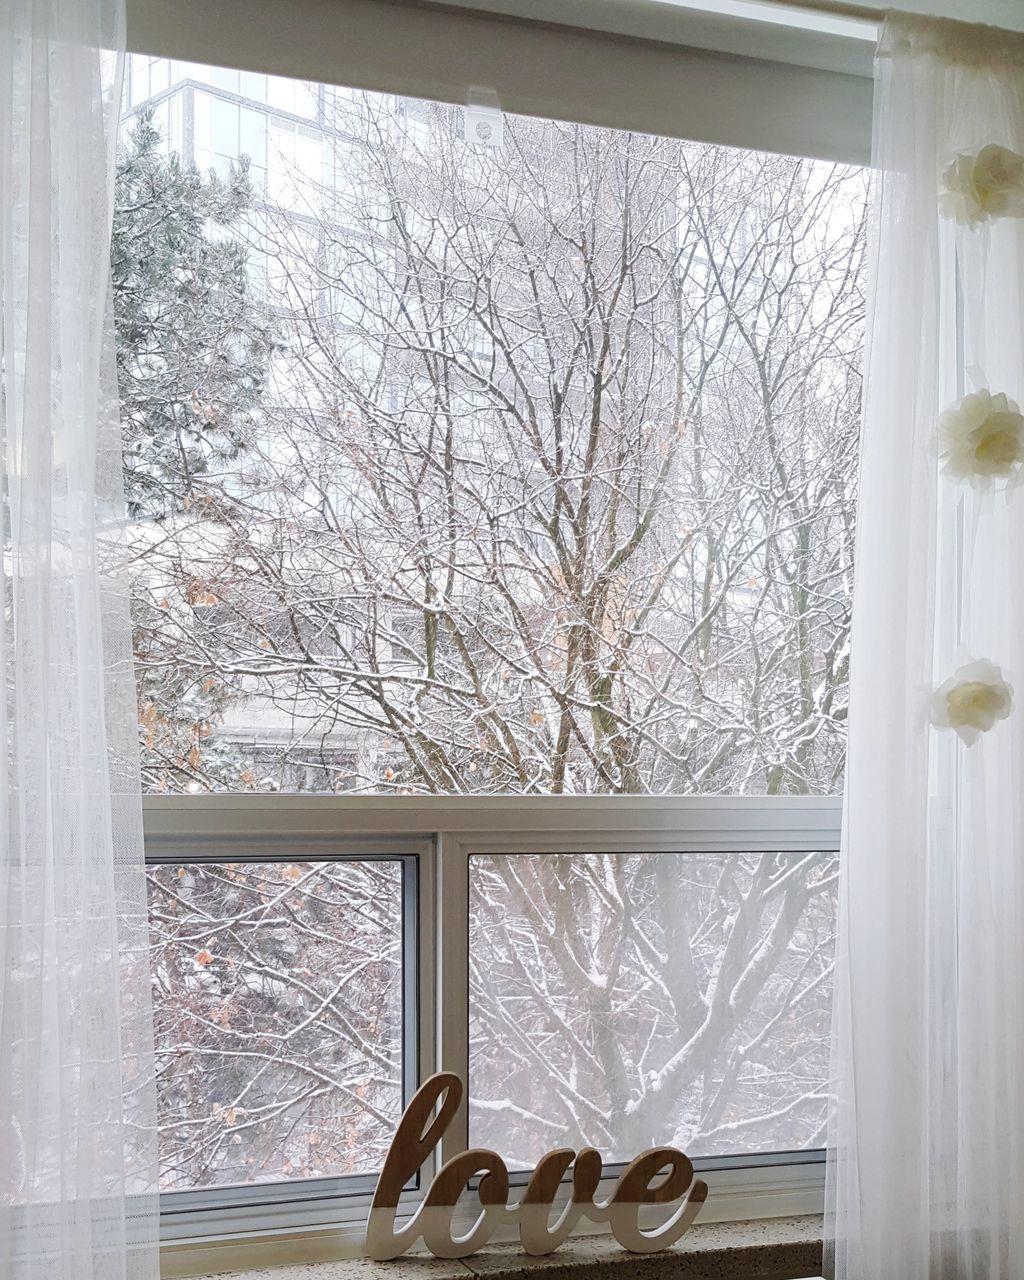 BARE TREES SEEN THROUGH WINDOW IN WINTER